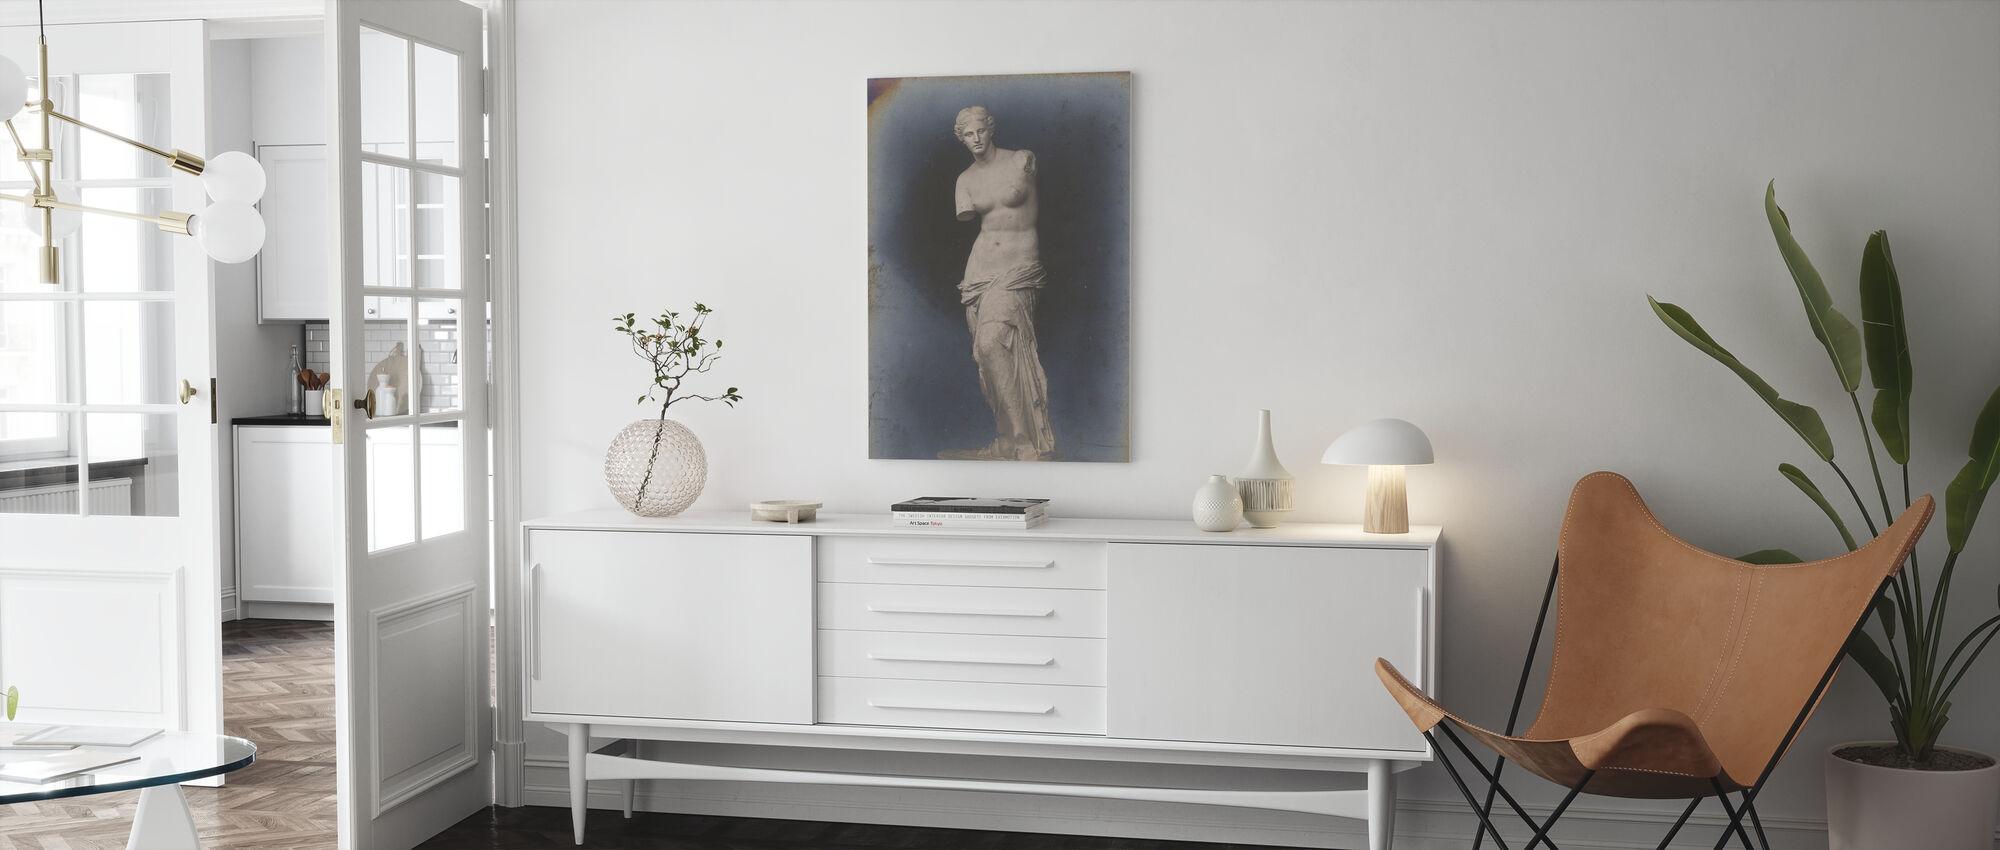 Milon Venus - Canvastaulu - Olohuone